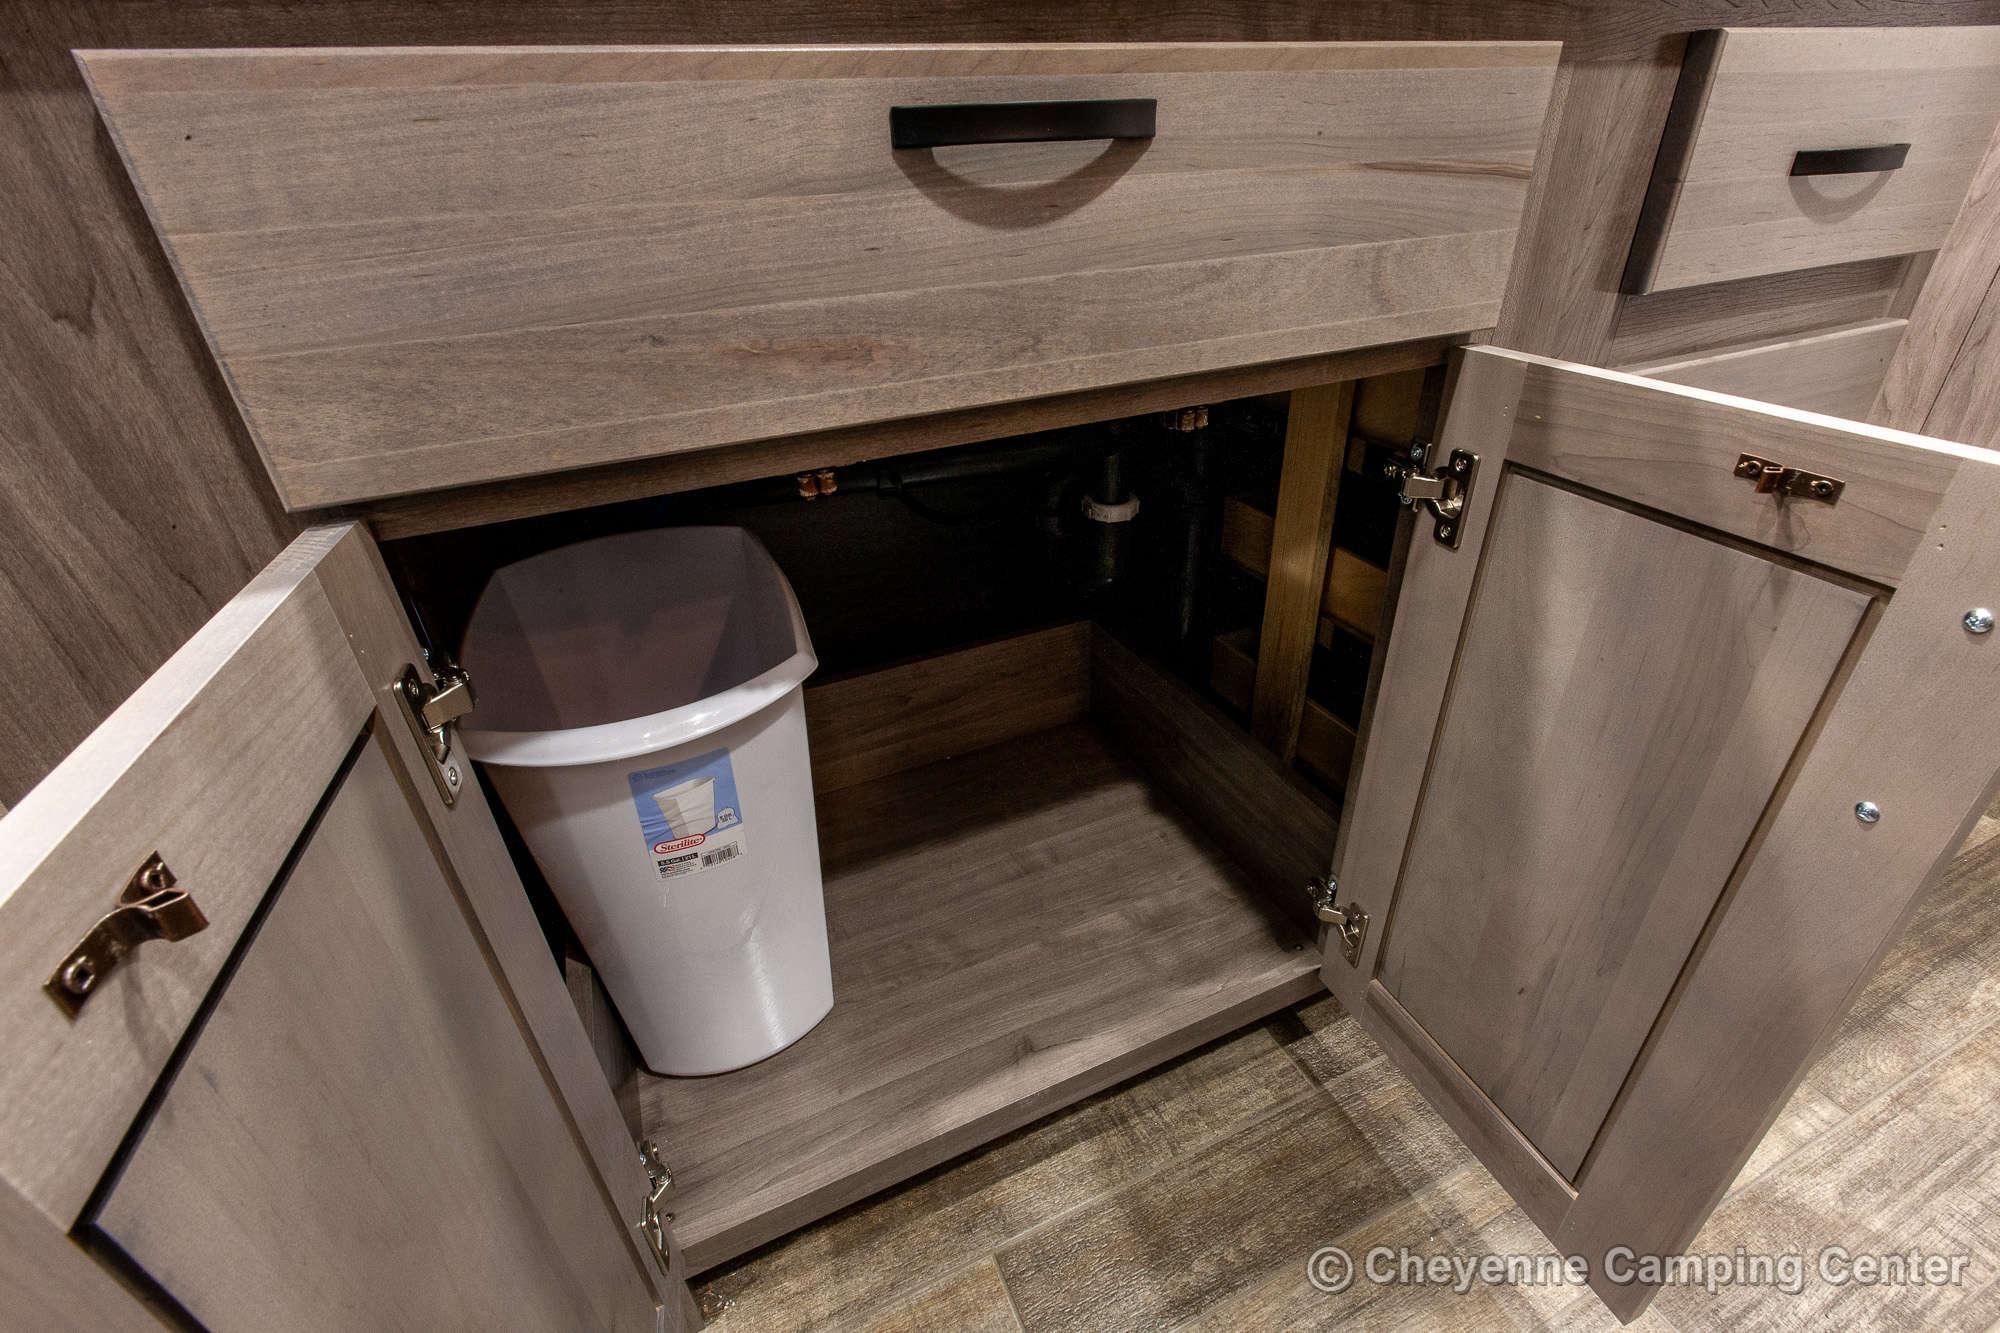 2022 Forest River Cedar Creek 371FL Fifth Wheel Interior Image